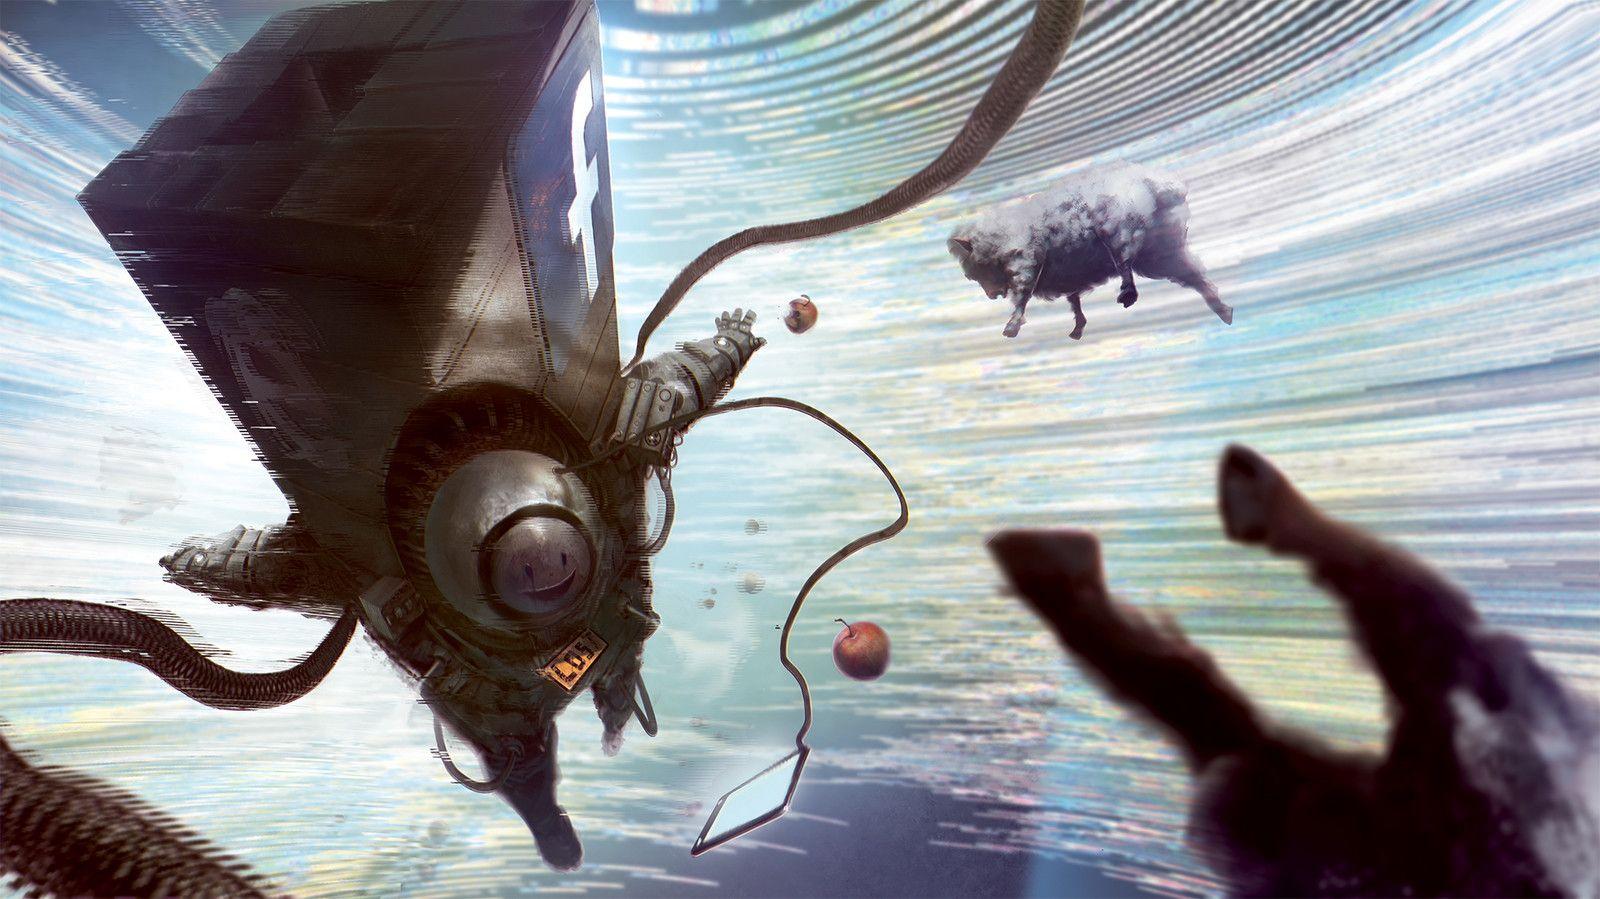 Carousel of life , Malaria/Michał Danielewicz on ArtStation at https://www.artstation.com/artwork/gLBdx